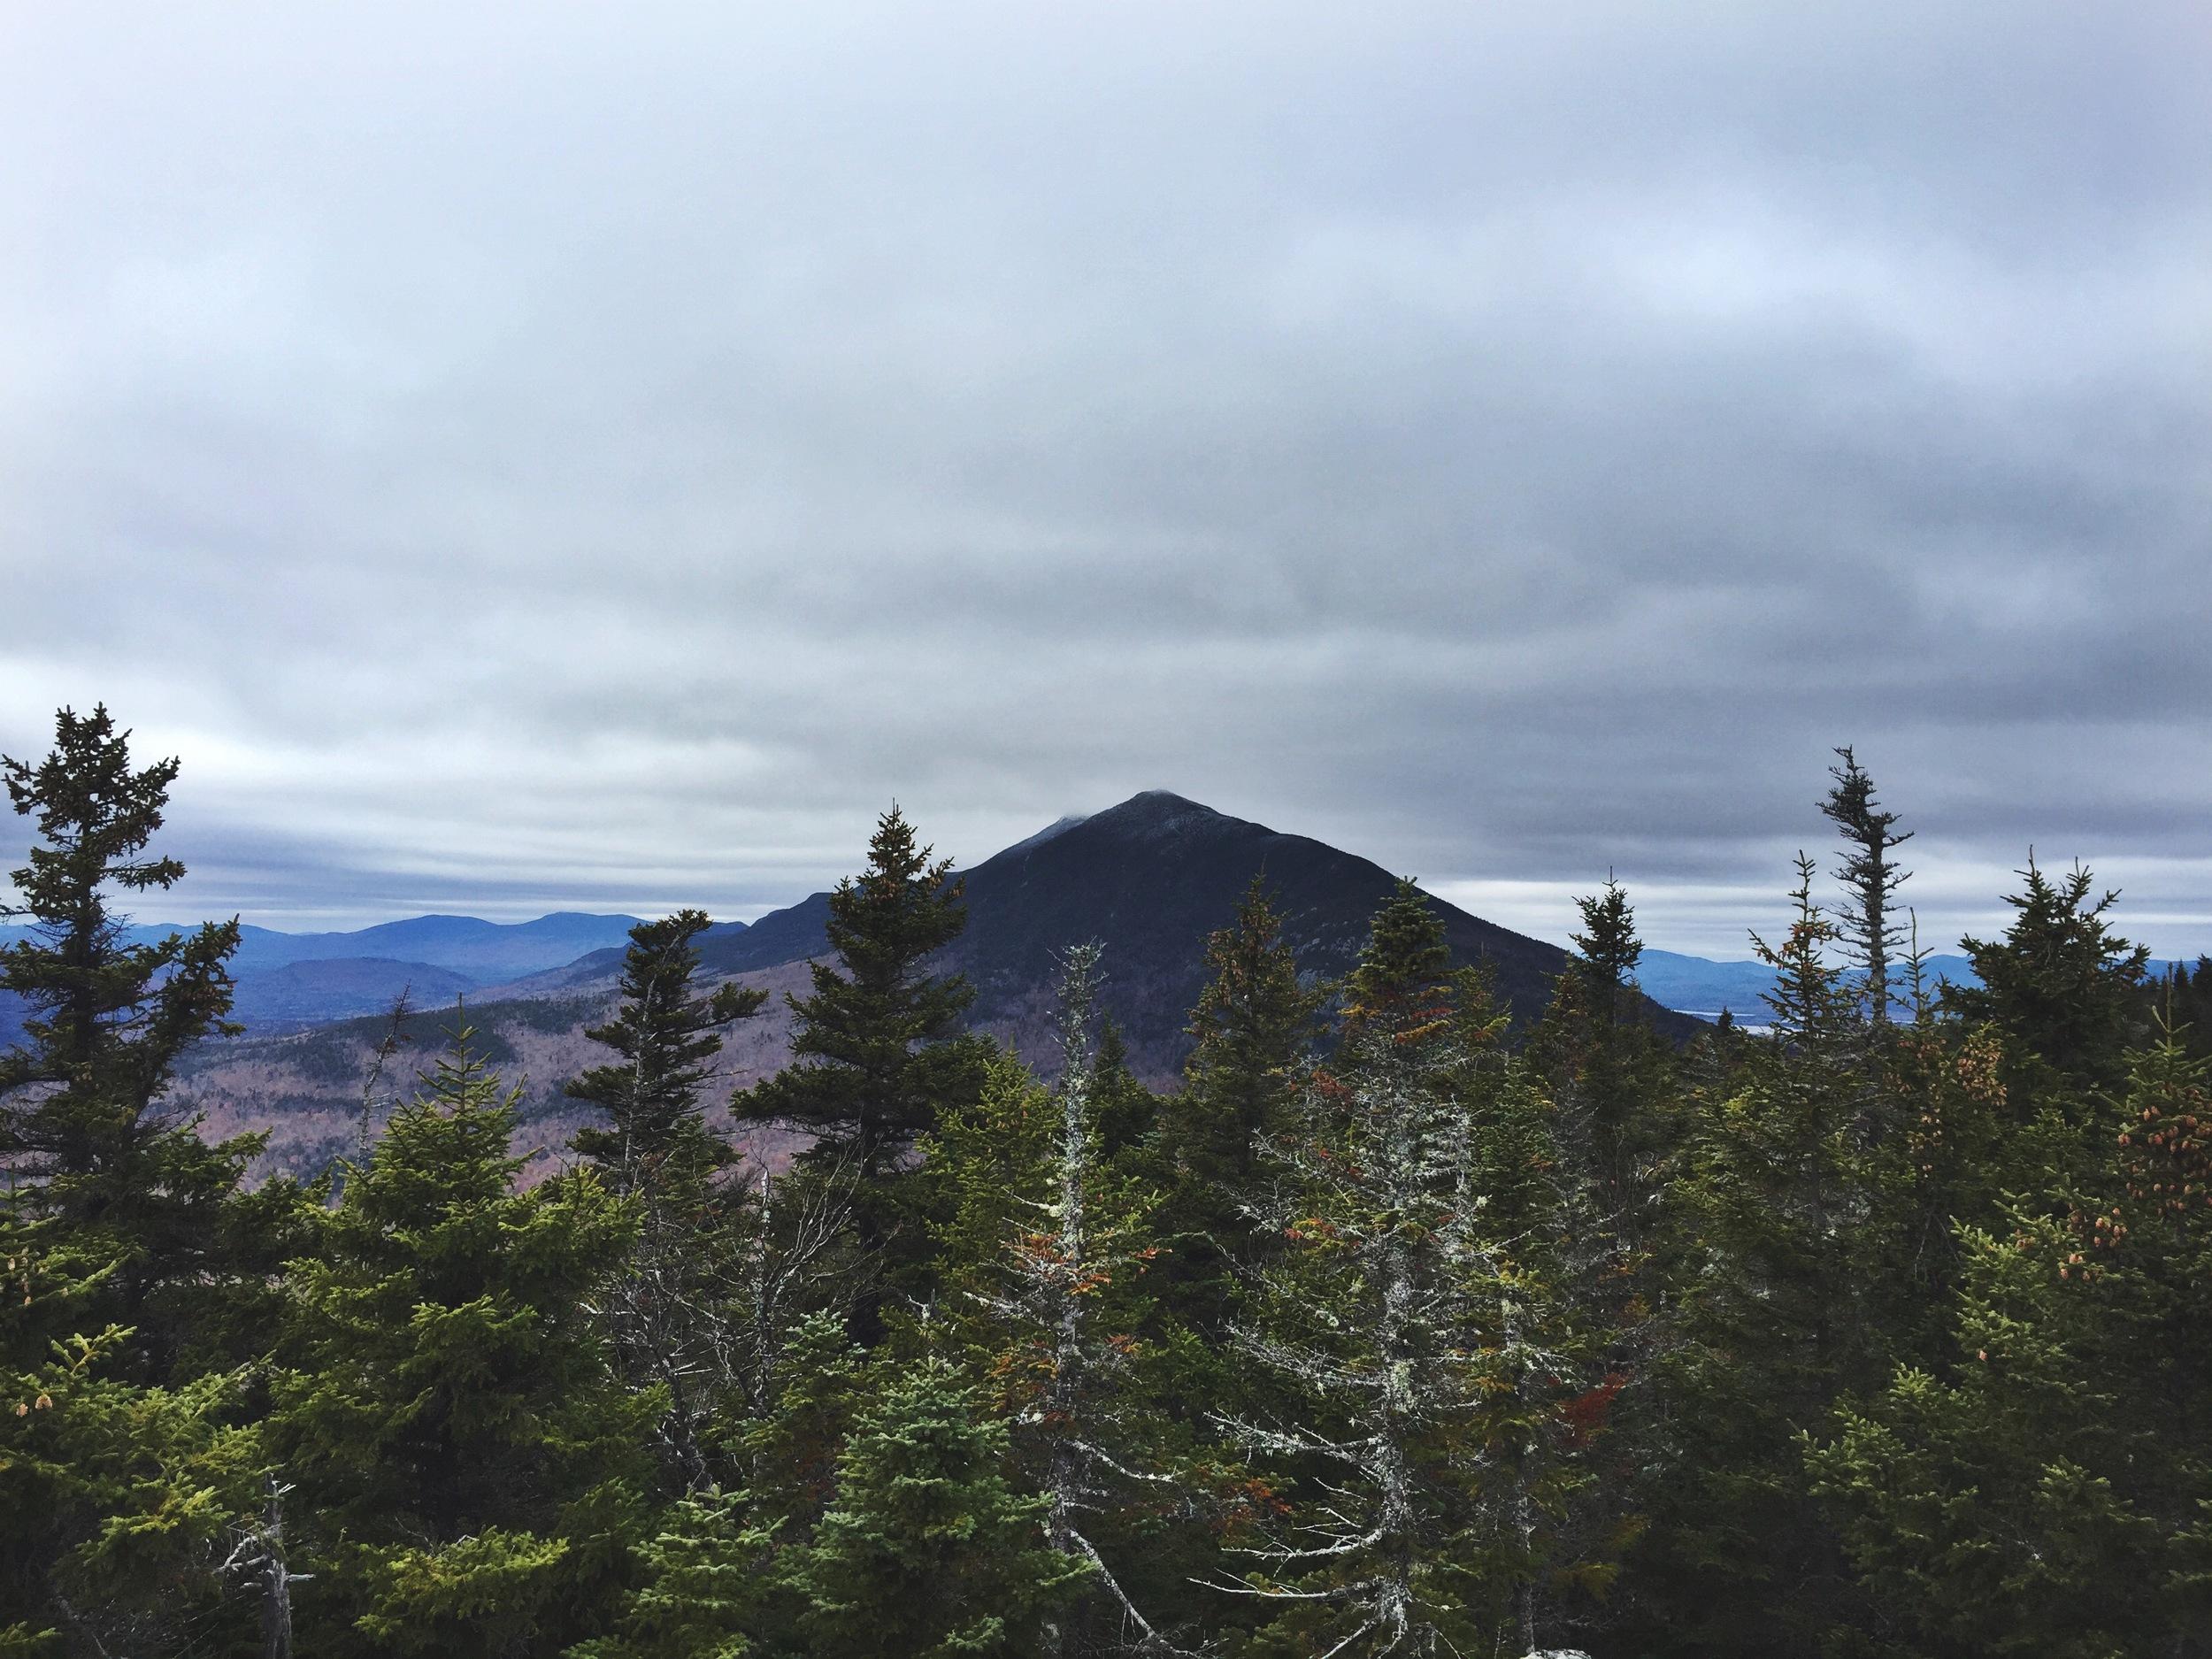 Views of the Bigelow Range from Little Bigelow Mountain.